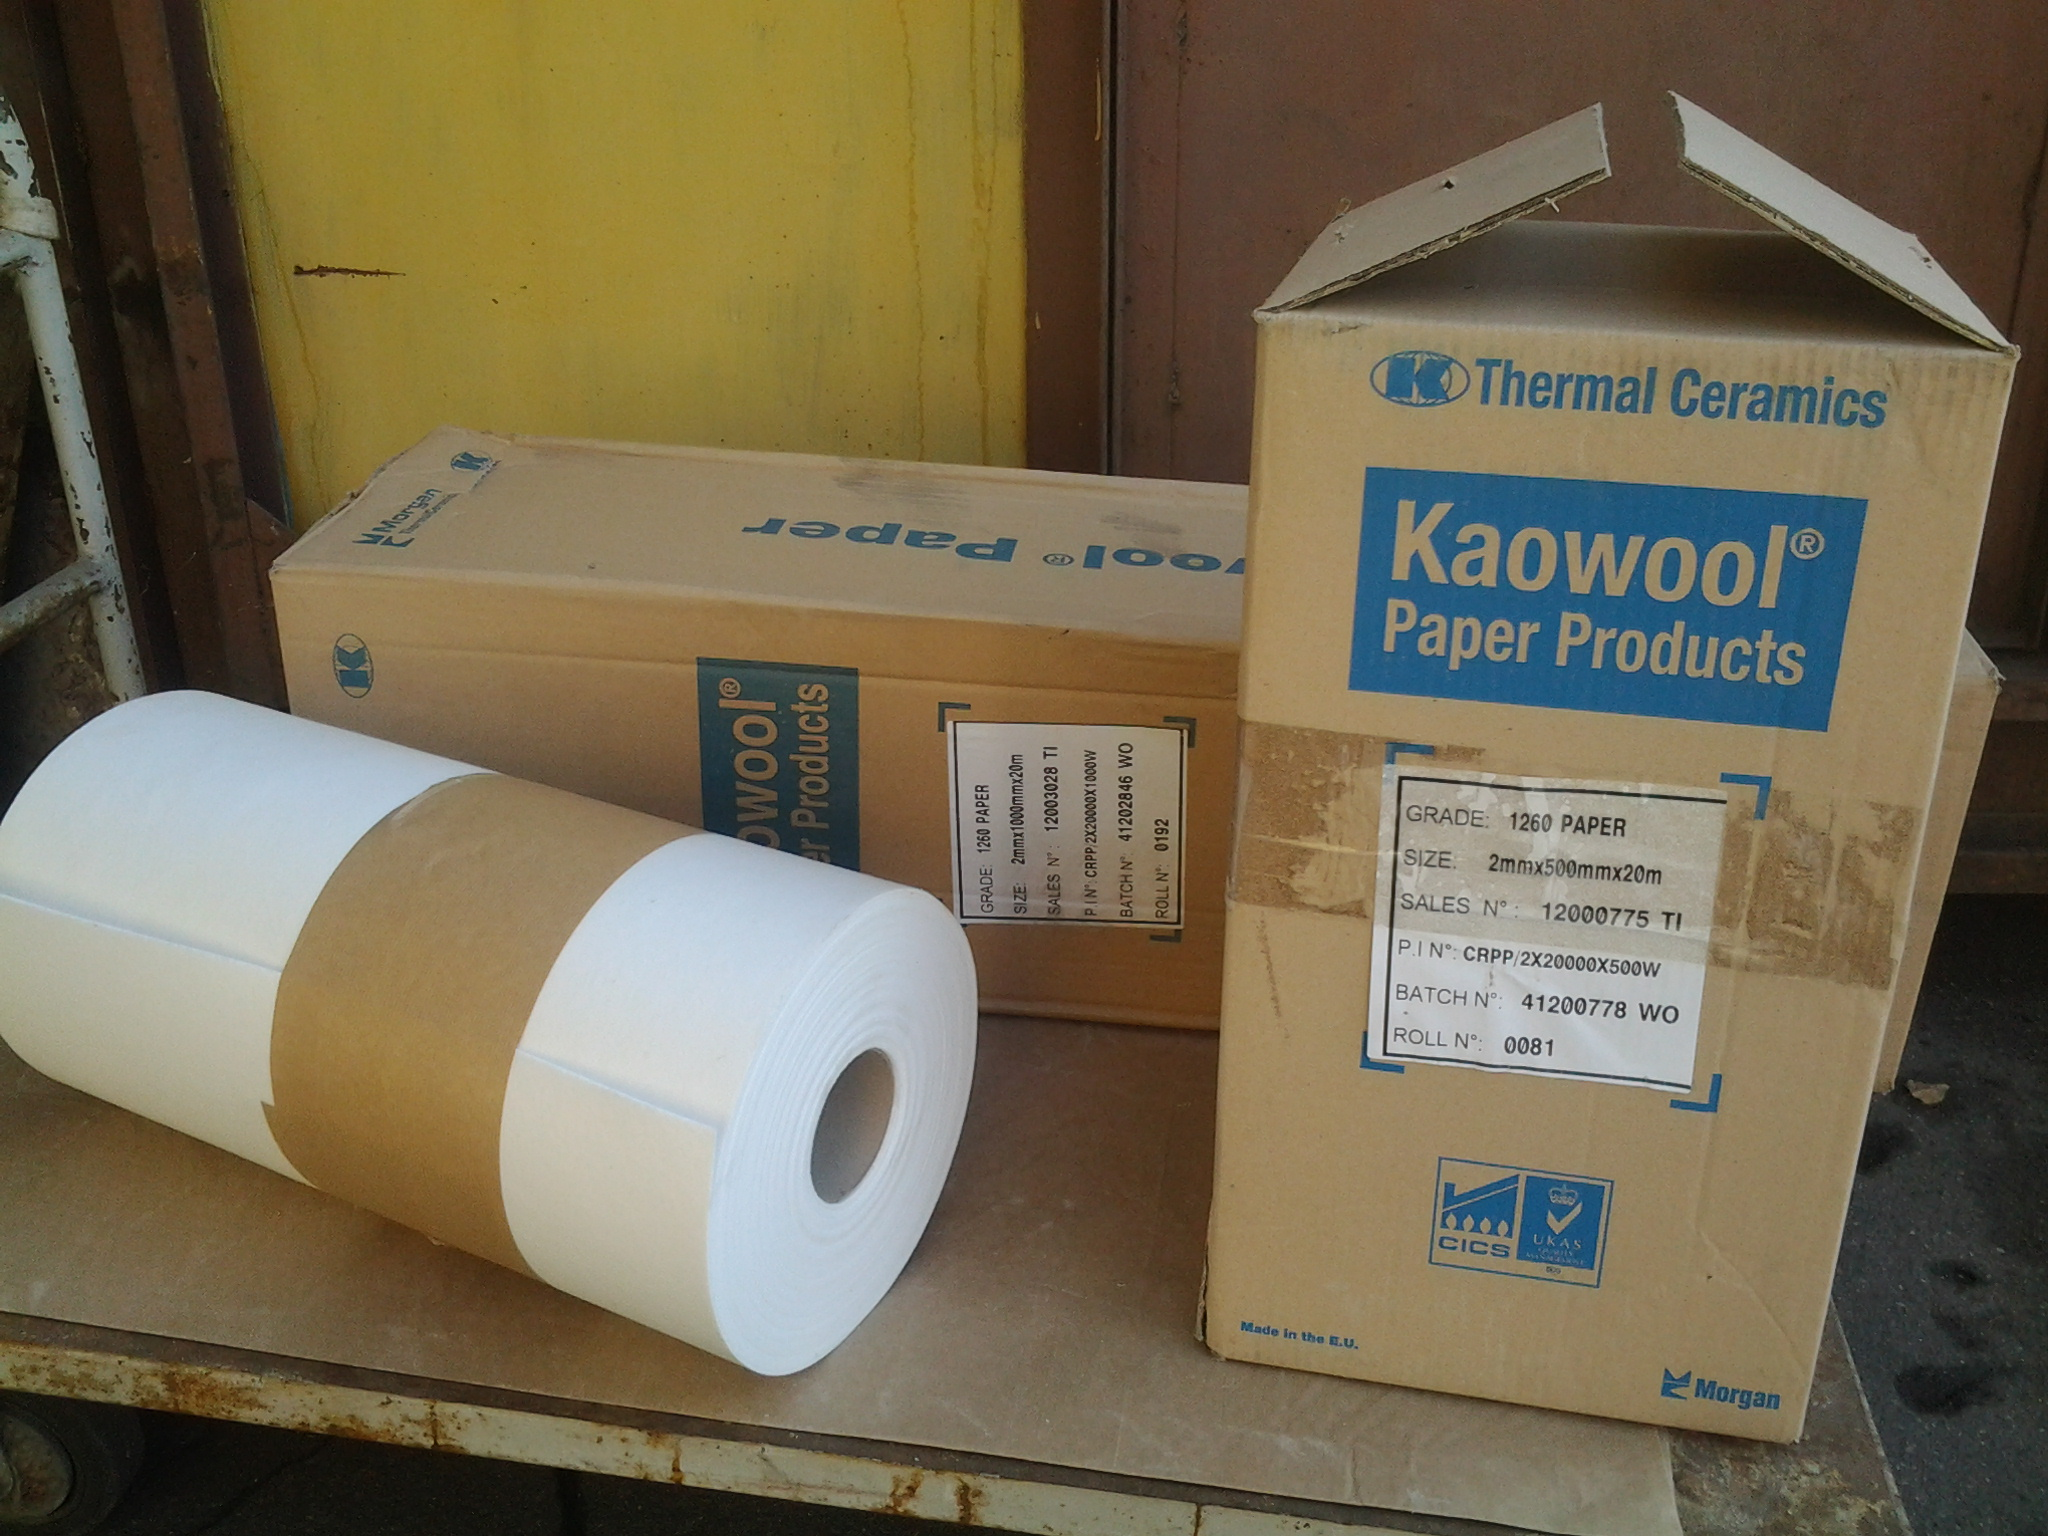 теплоизоляционная бумага